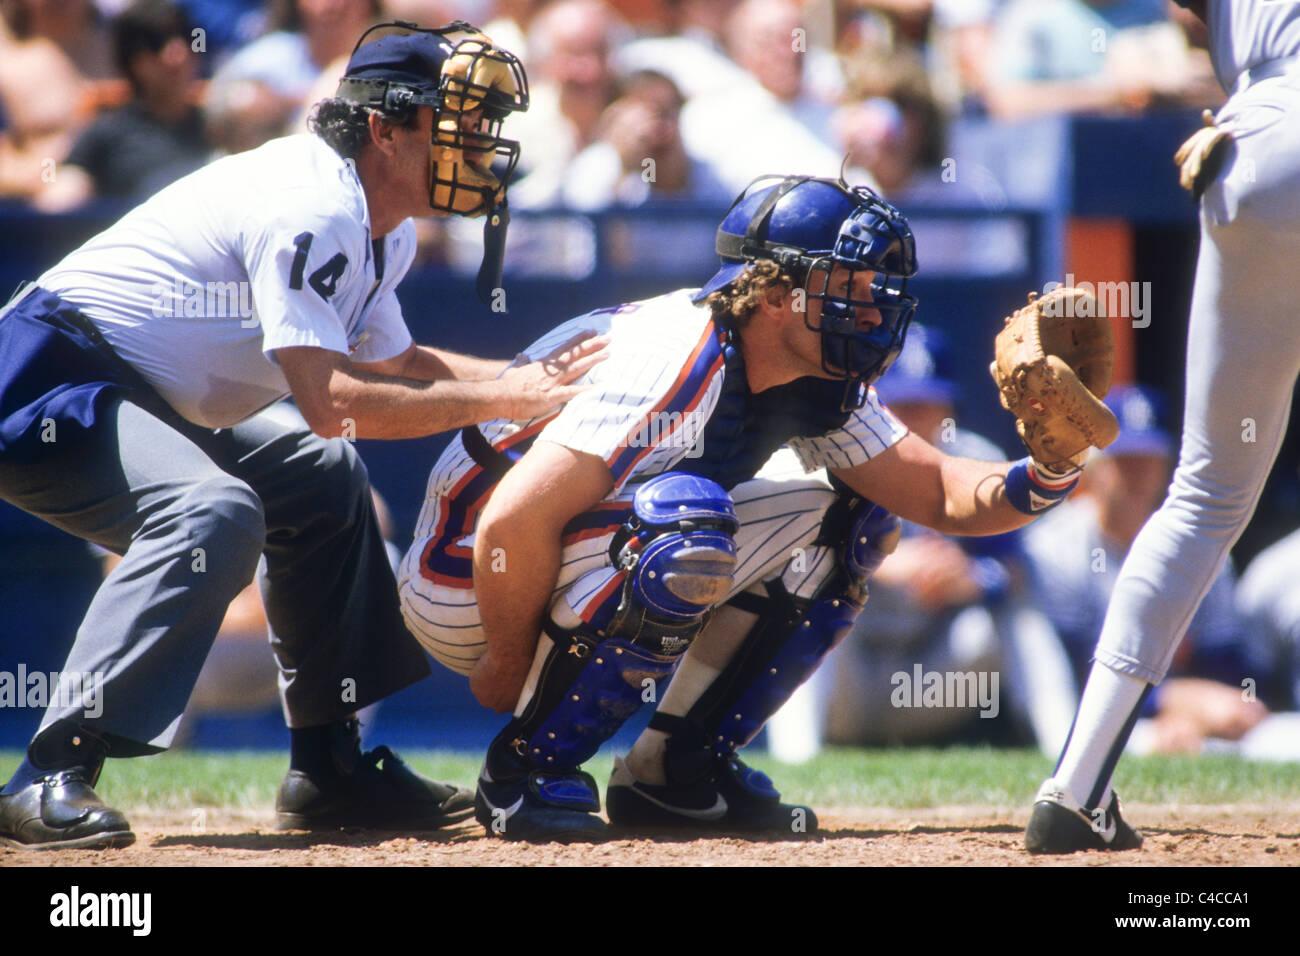 Gary Carter spielen bei den New York Mets. Stockbild